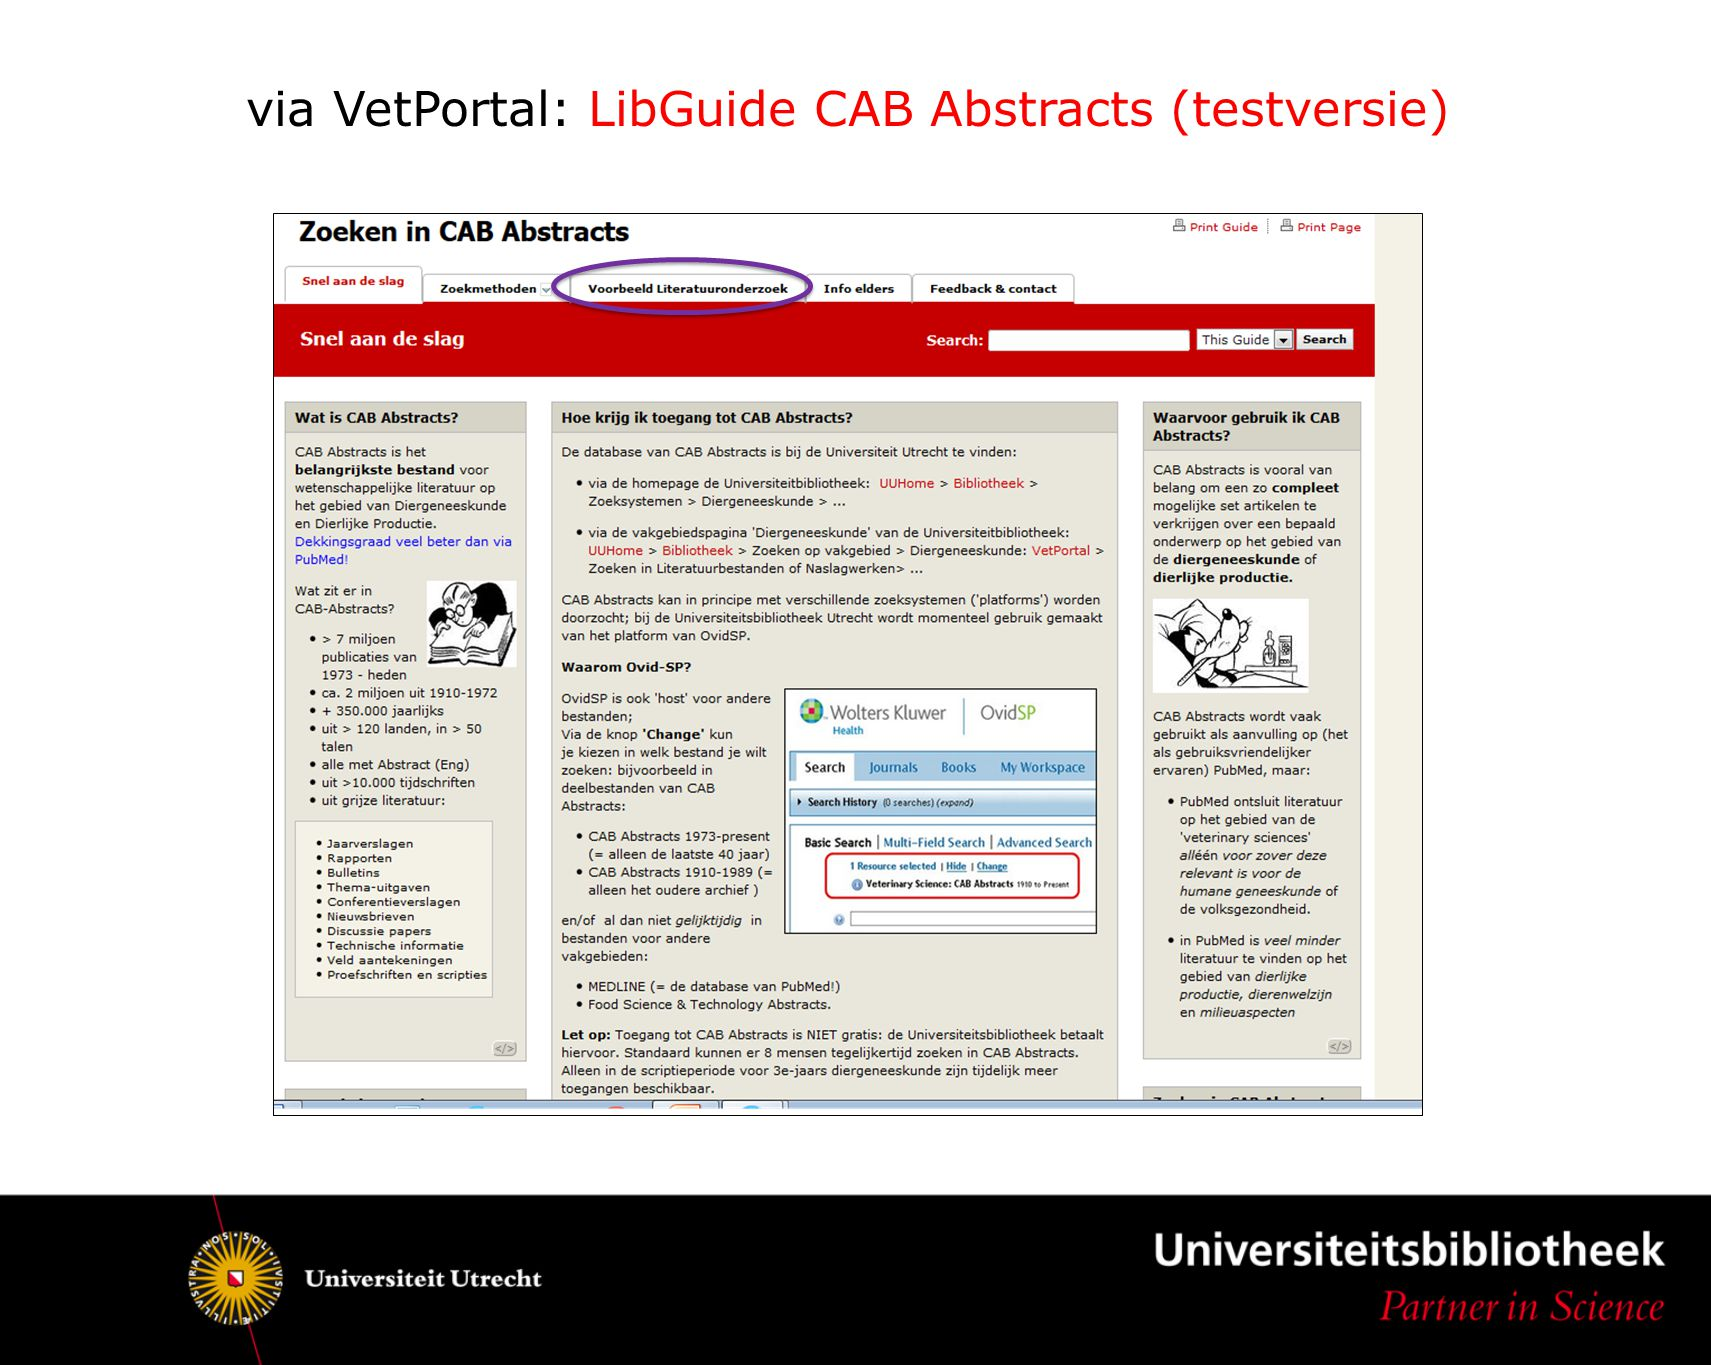 via VetPortal: LibGuide CAB Abstracts (testversie)